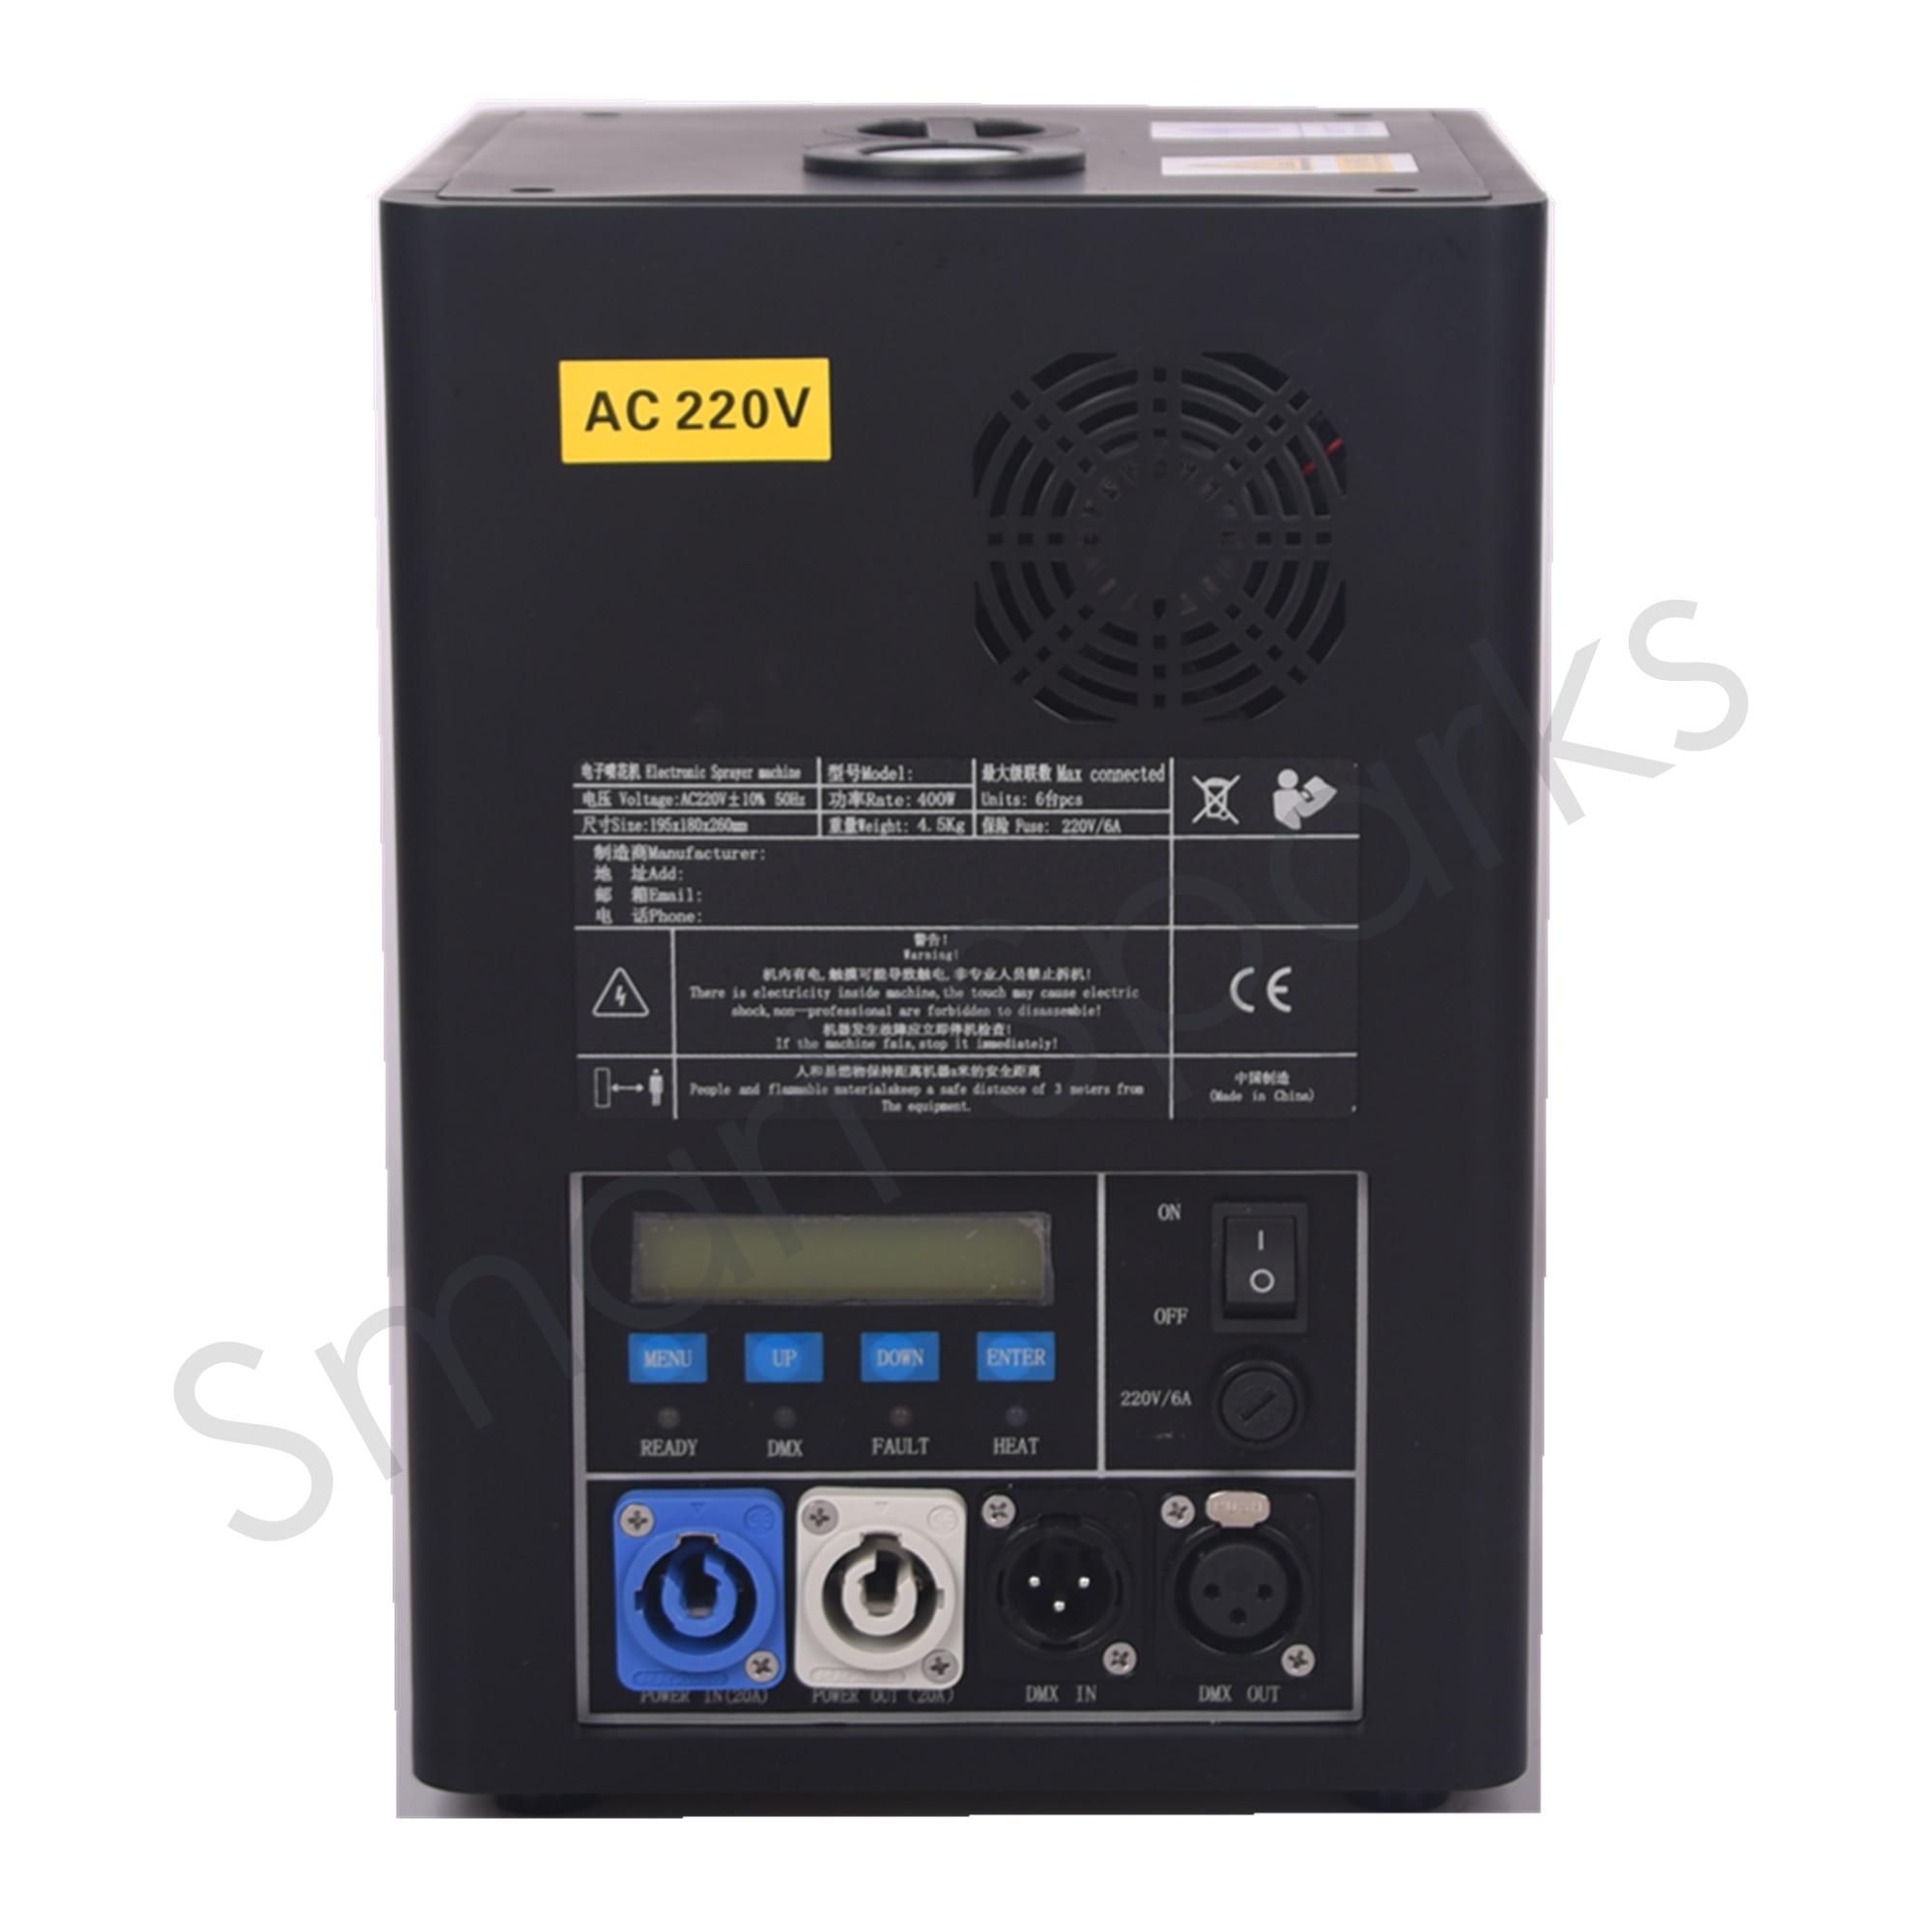 Prosound الإضاءة الألعاب النارية آلة تحكم dj تحكم XG18H02